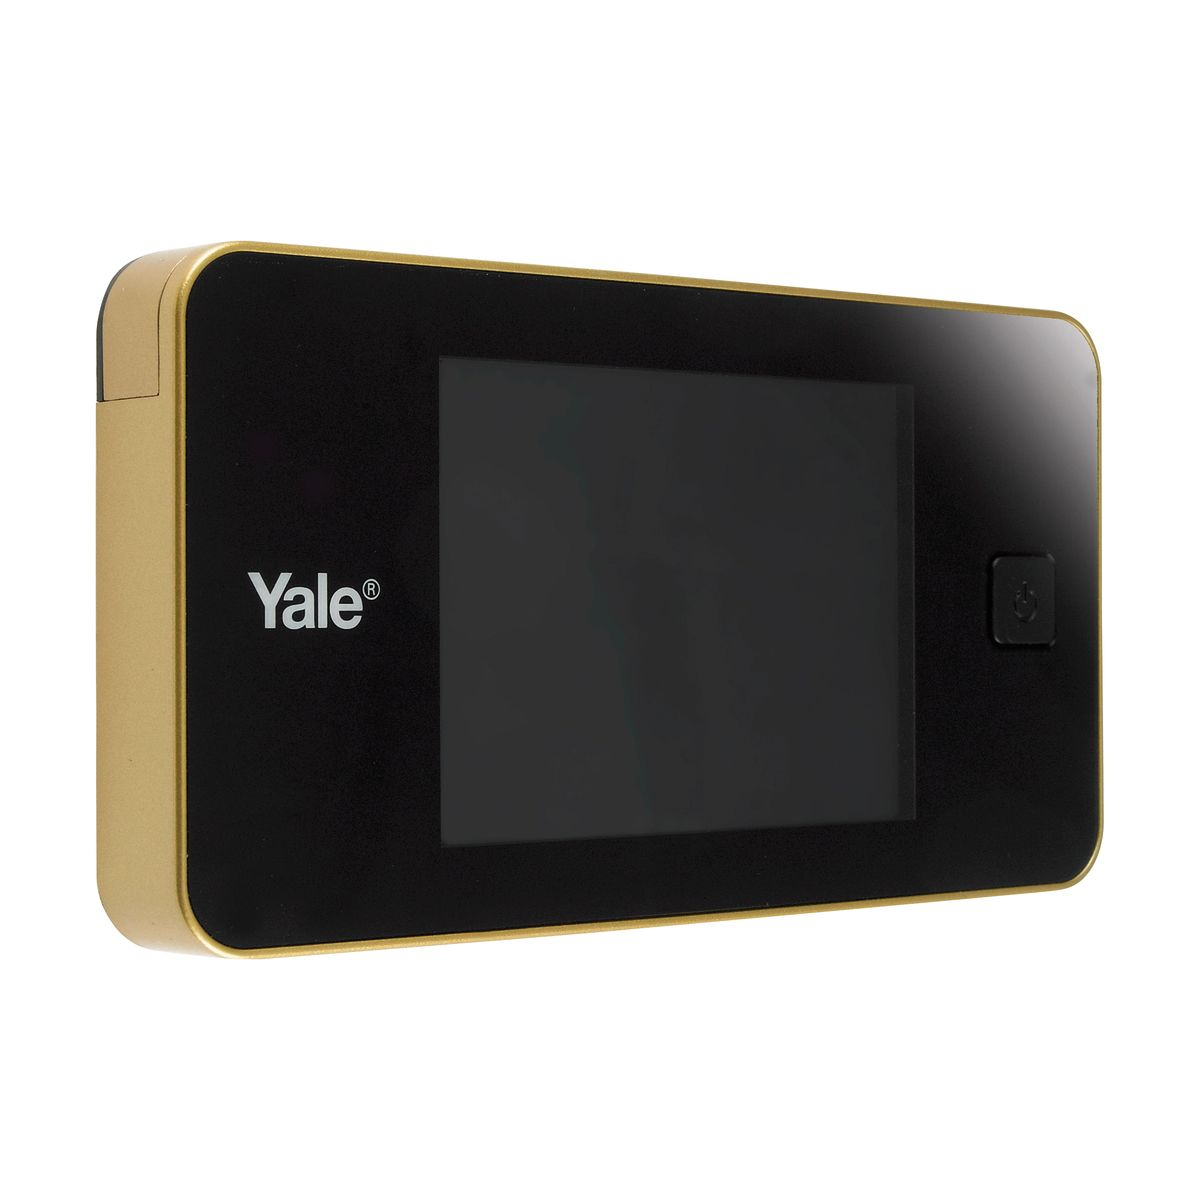 Spioncino digitale per porte blindate porte da interno portoncini yale ddv standard ottone - Porte blindate prezzi leroy merlin ...